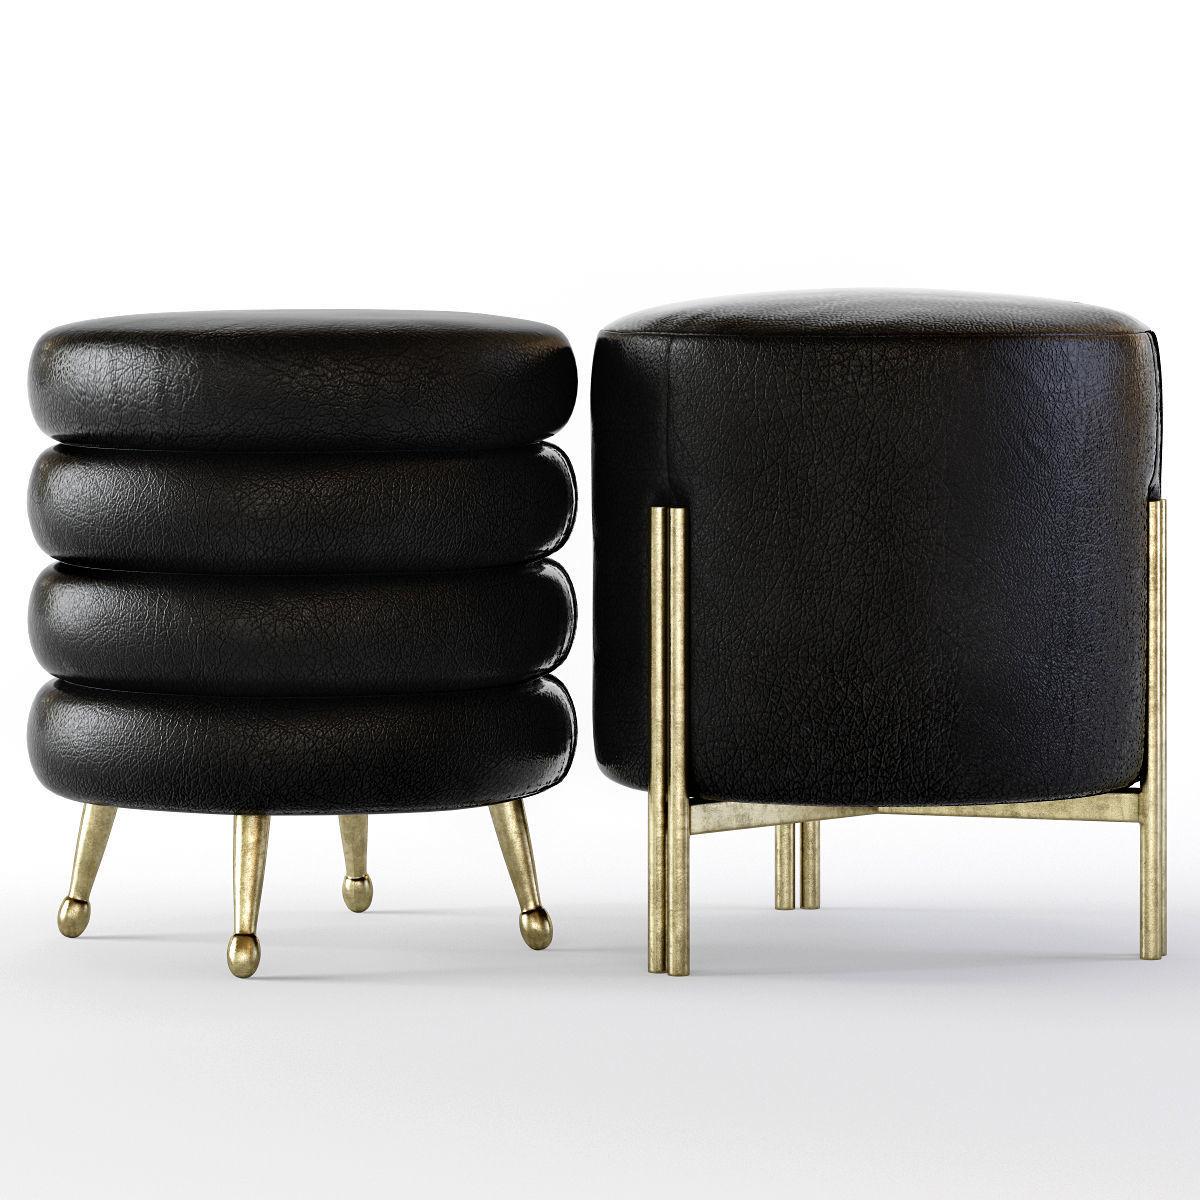 brand new 9bdc3 03940 Kelly Wearstler Melange and Laurel Stools | 3D model